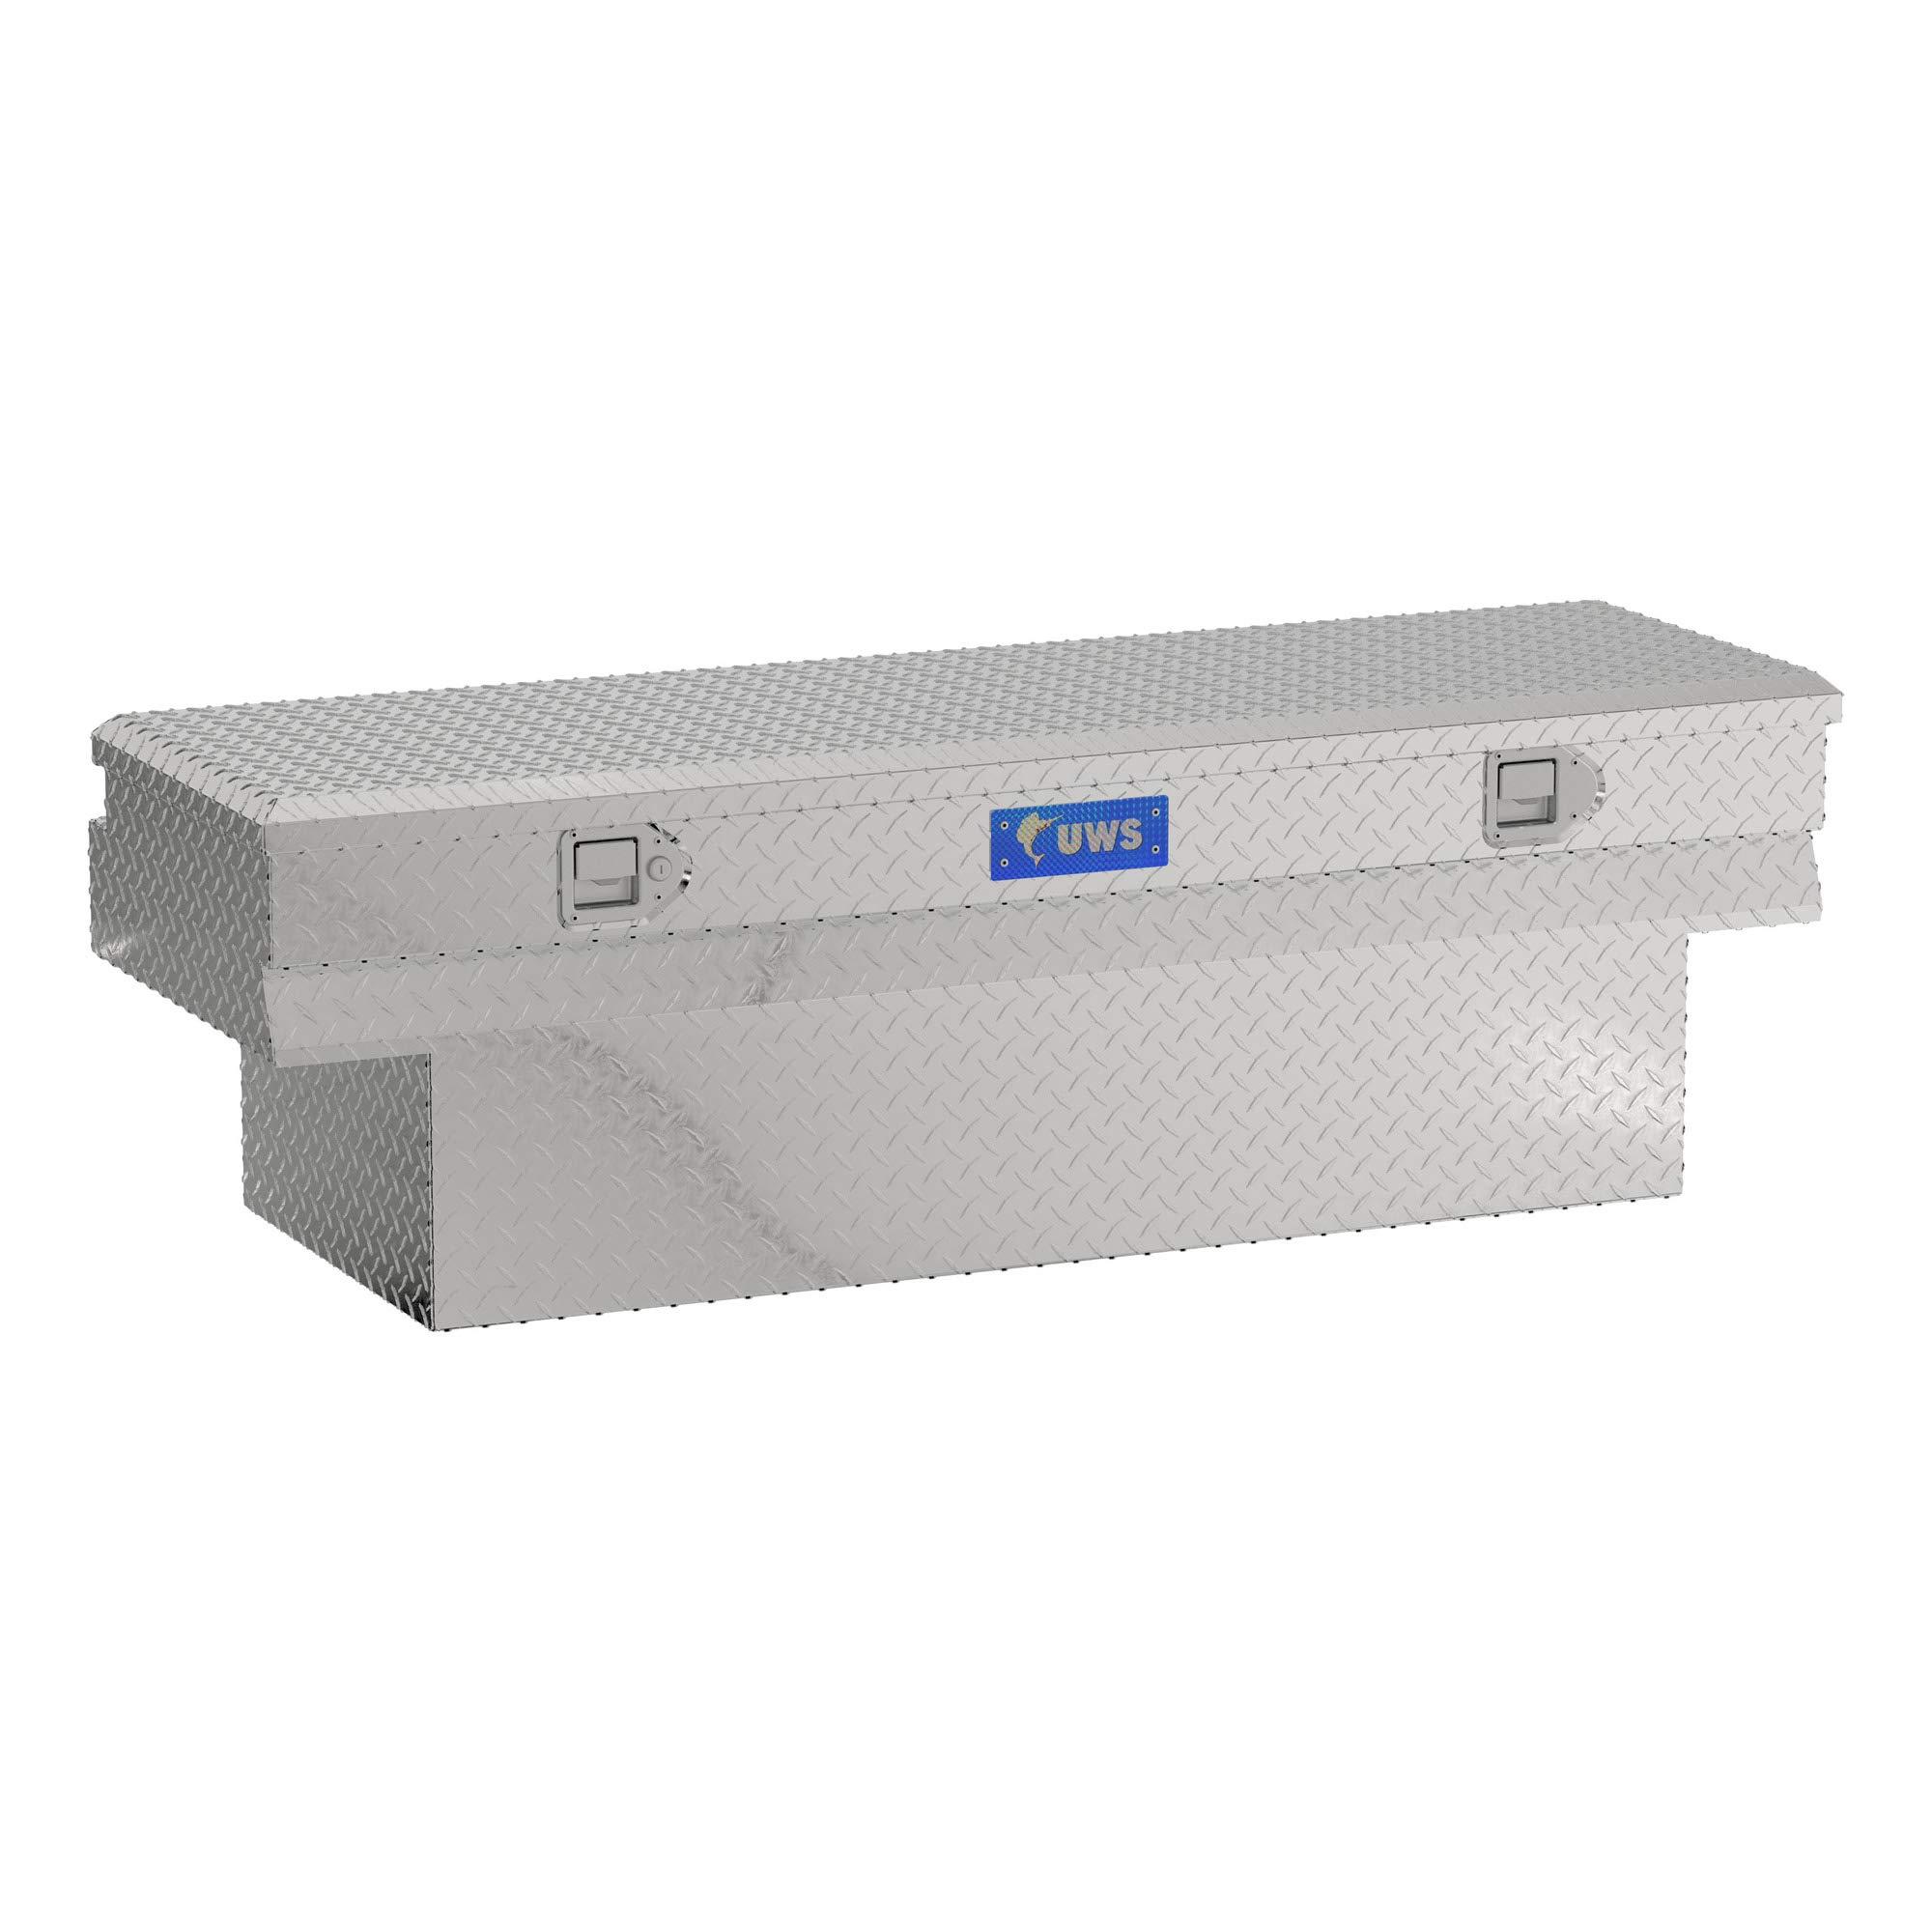 UWS EC20331 60-Inch Heavy-Wall Aluminum Notched Truck Storage Box, RigidCore Lid